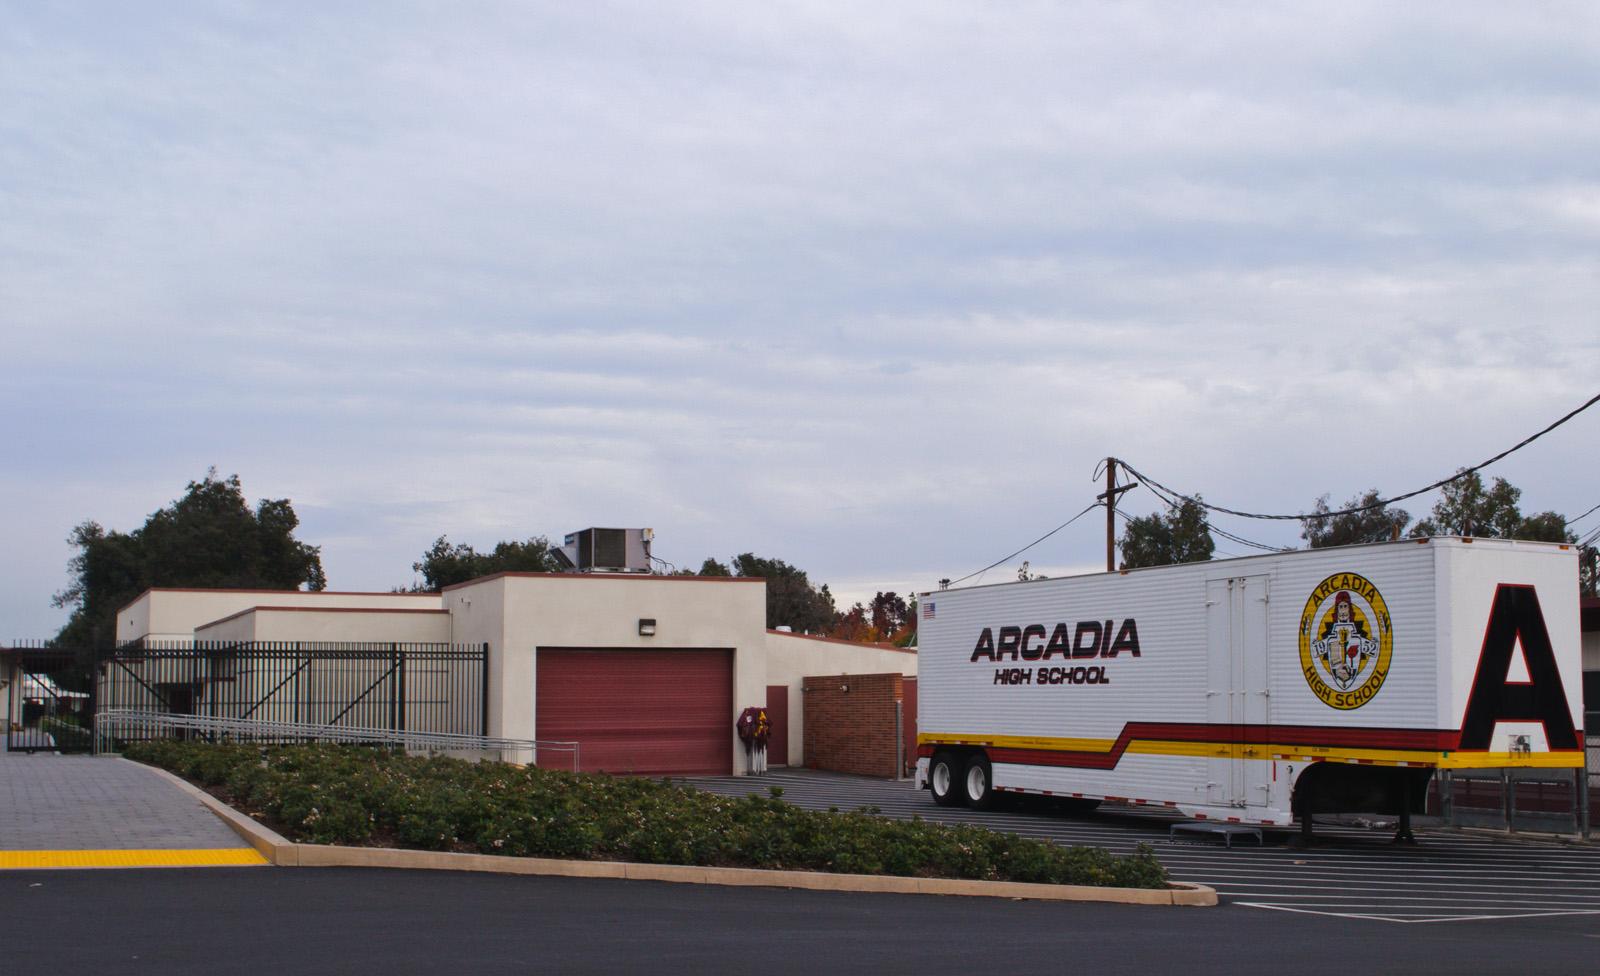 File Arcadia High School 8310810793 Jpg Wikimedia Commons